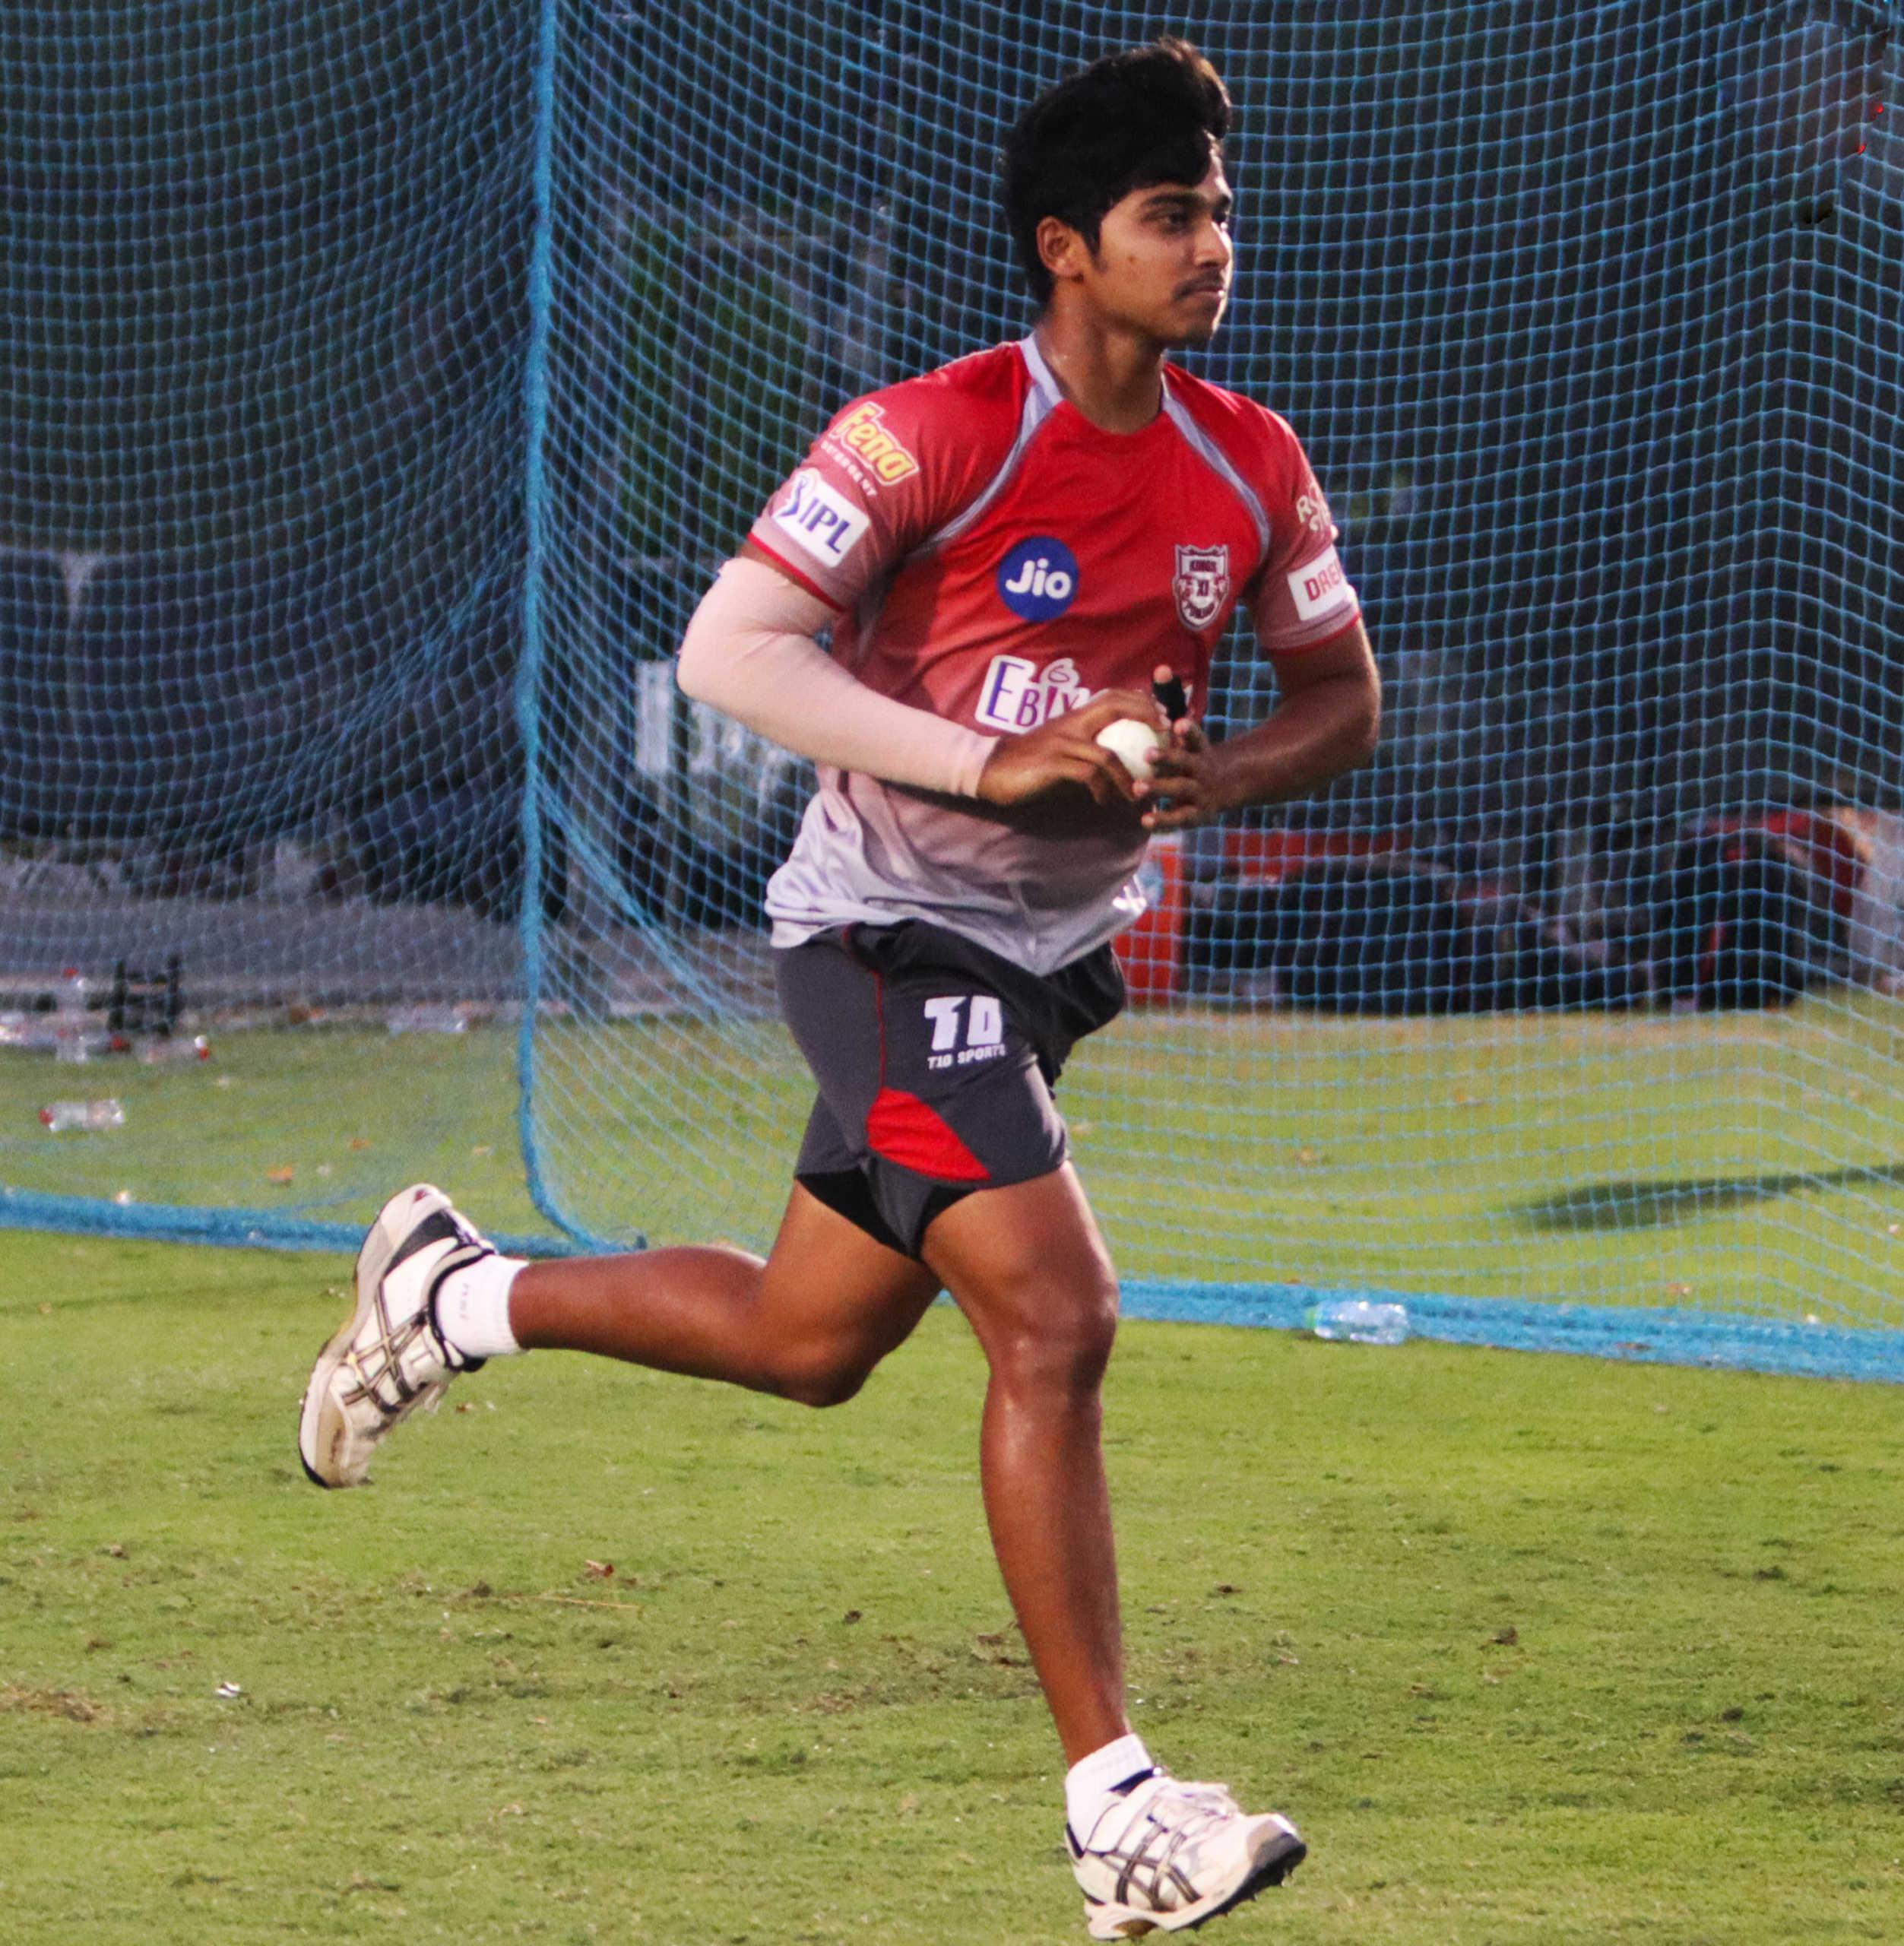 IPL 2020 images : royal challengers bangalore and kings xi punjab practice photos, సమరం లో పంజాబ్ తో బెంగళూరు (ఫోటోలు).